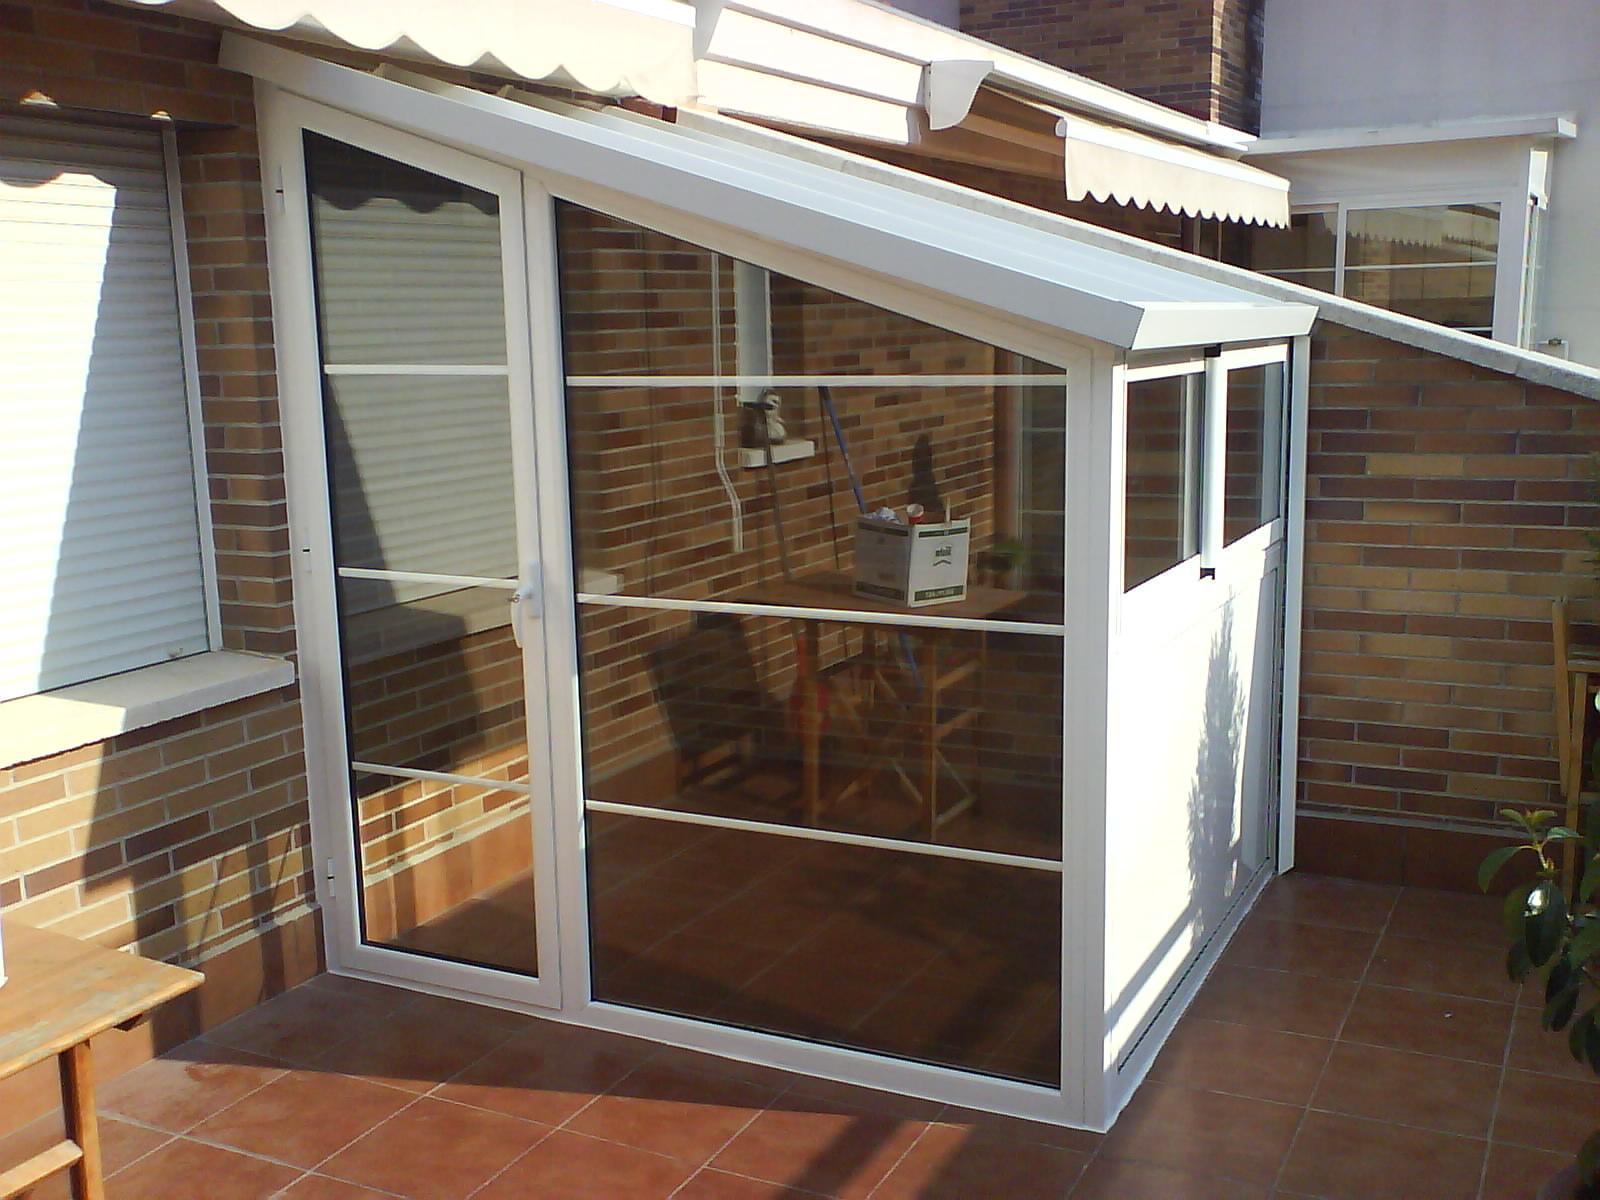 Cerramiento de aluminio tipo caseta de exterior terraza en for Patio con lavadero